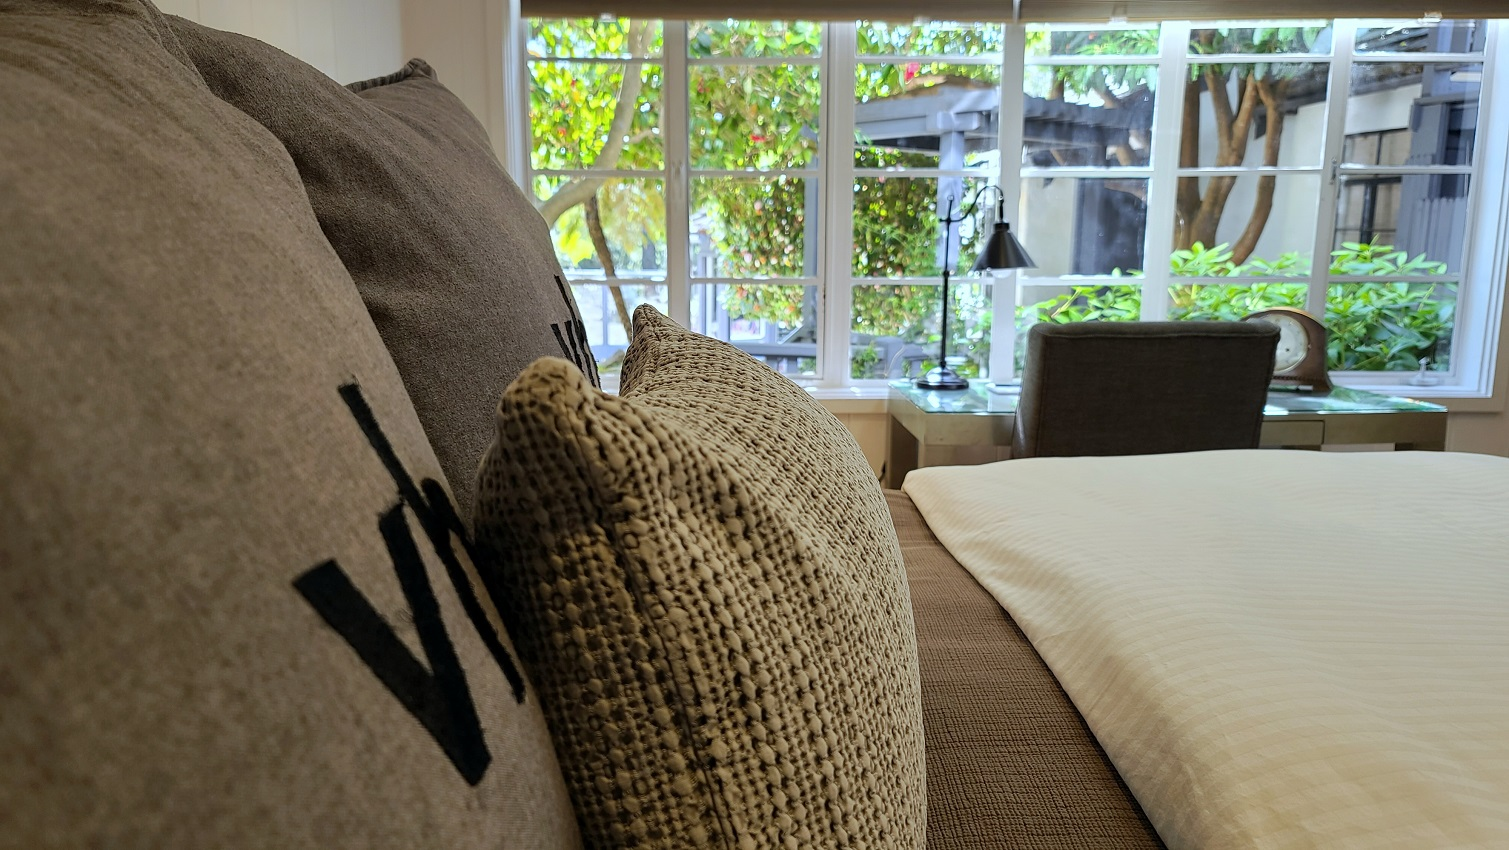 Vagabond House pillows